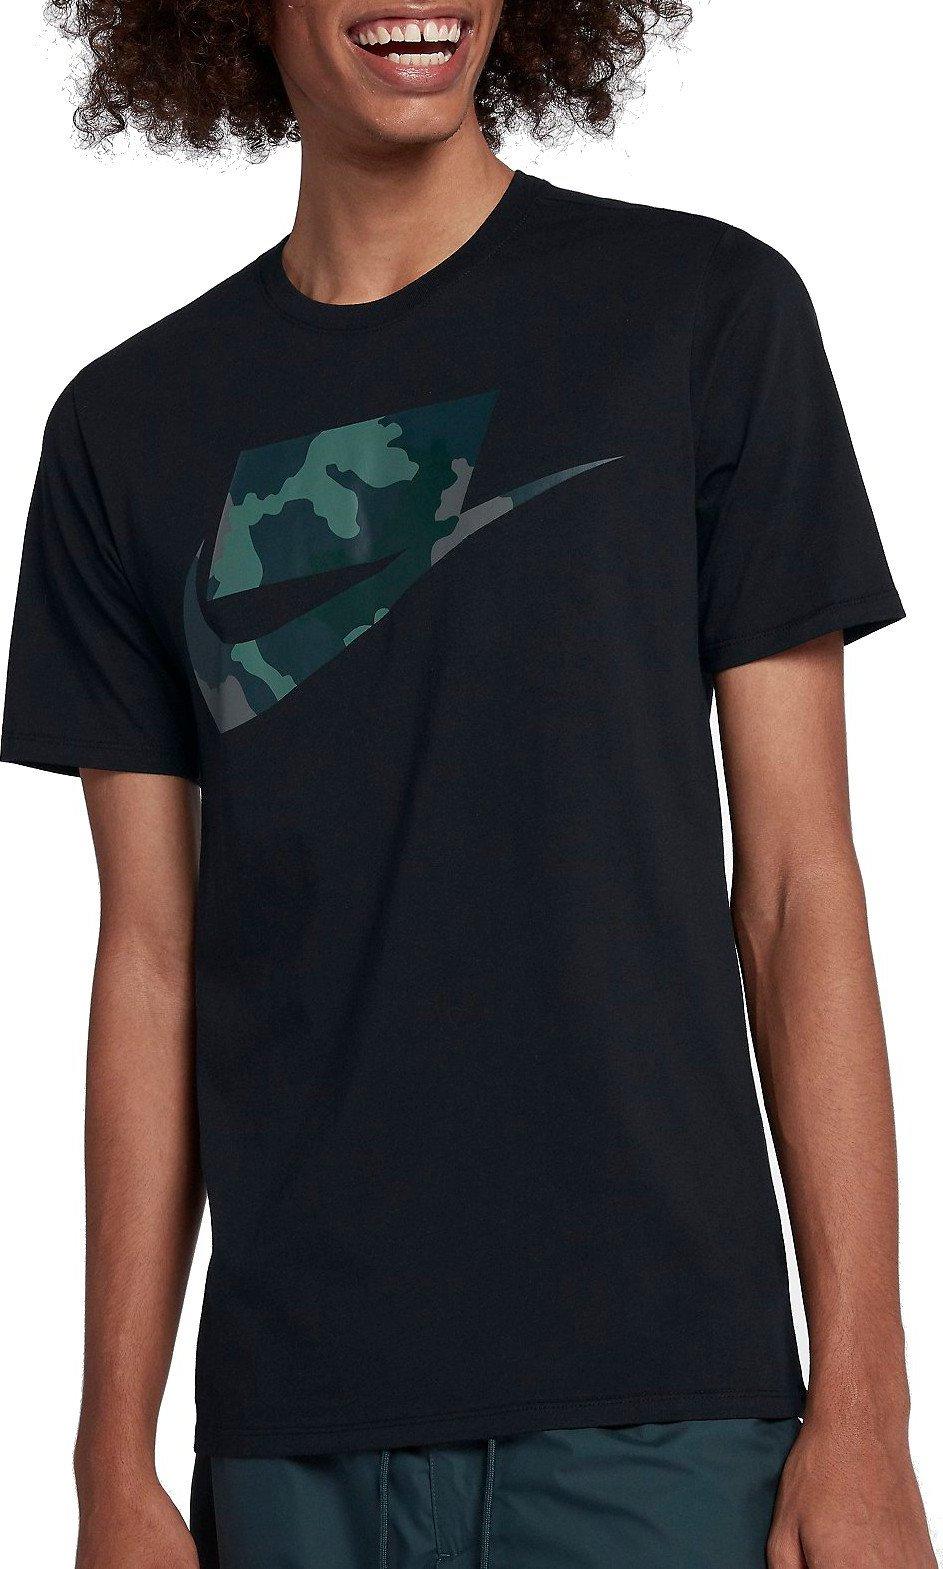 NIKE Sportswear Innovation Tee Black Camo od 553 Kč • Zboží.cz ce6a2c854ab